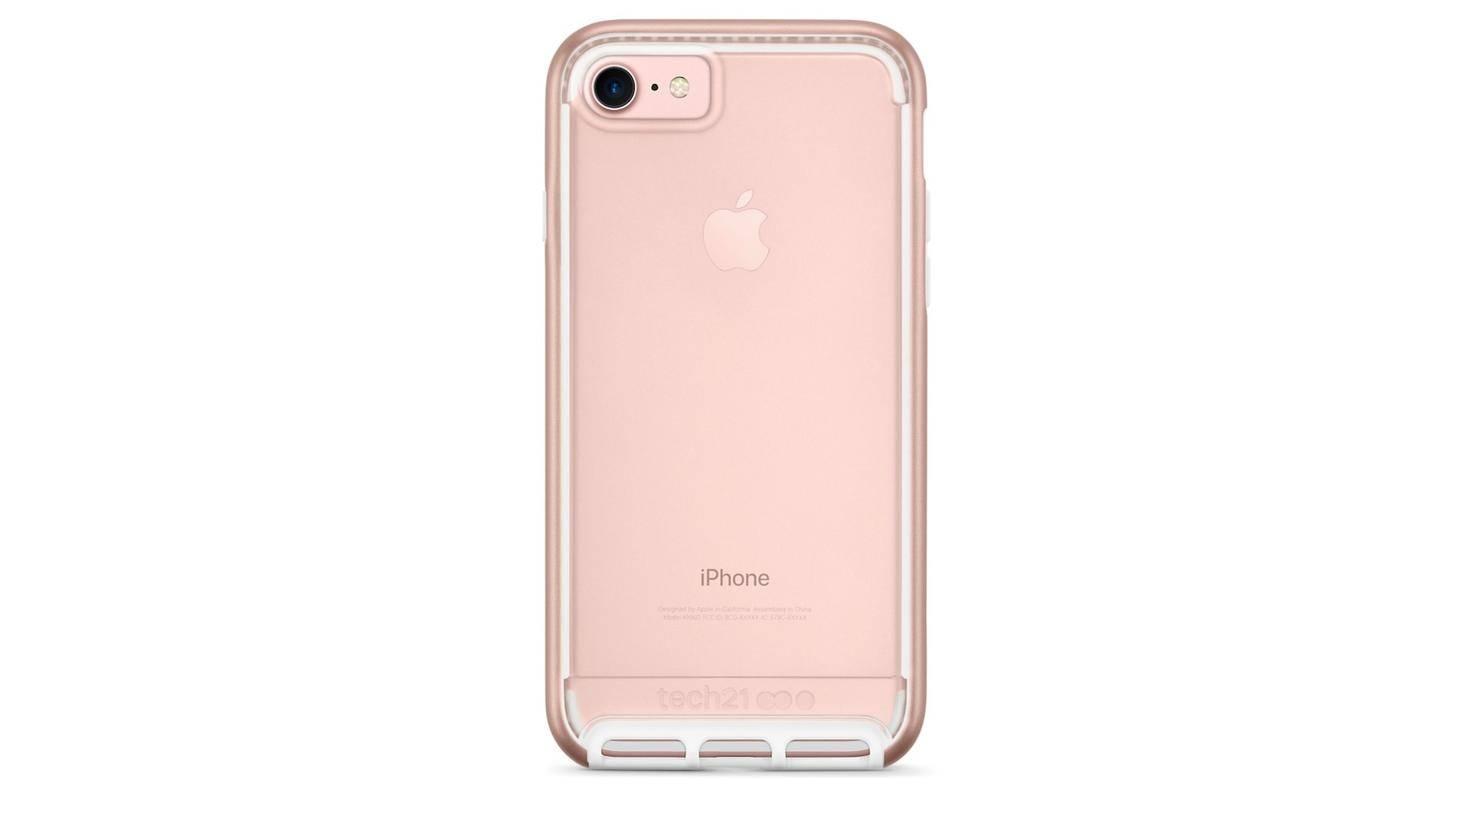 iPhone 7 Tech 21 Evo Elite Case